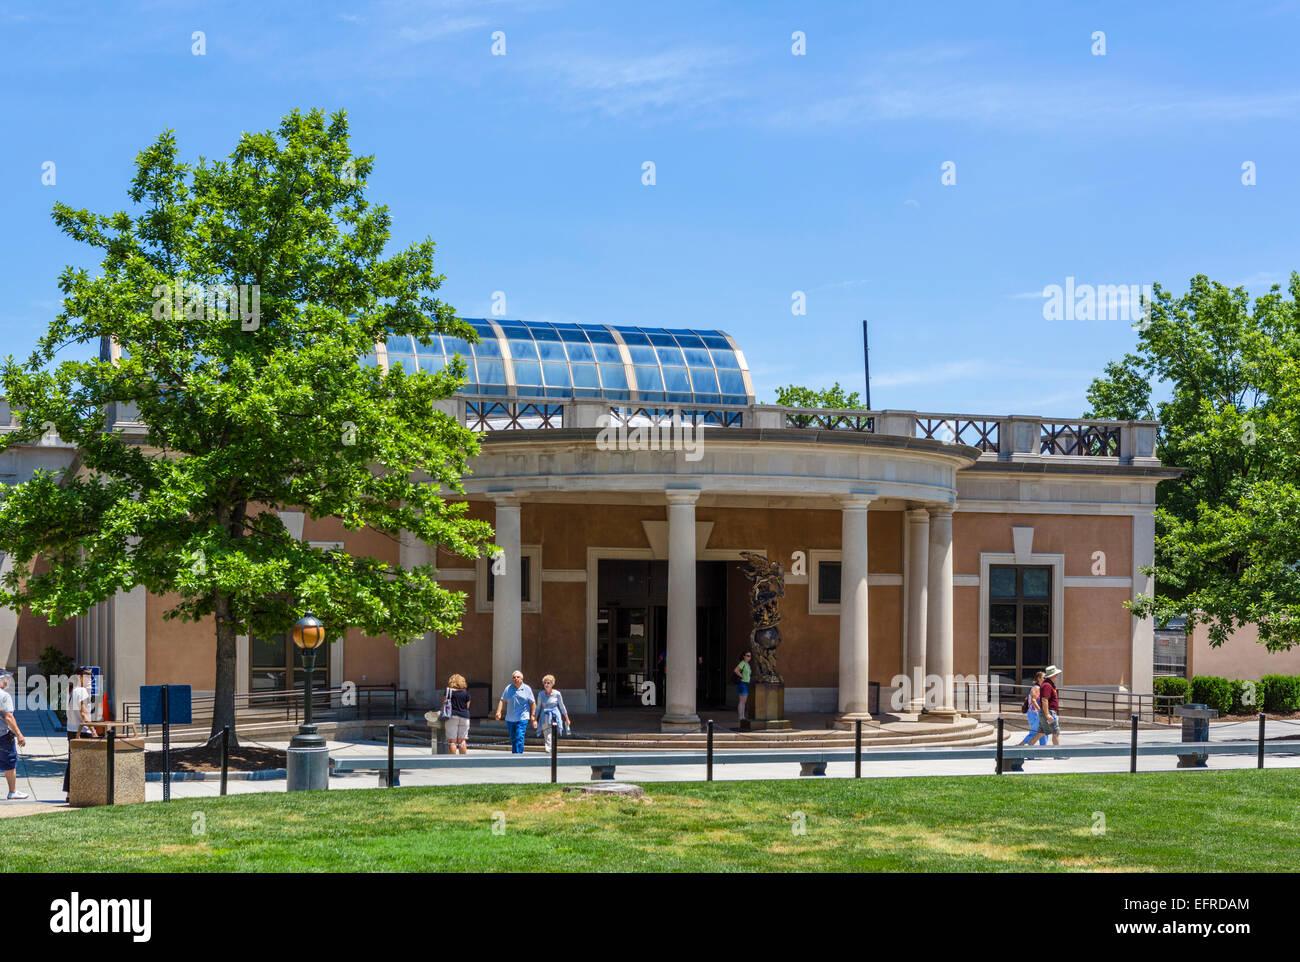 The Visitor Center at Arlington National Cemetery near Washington DC, Arlington, Virginia, USA - Stock Image